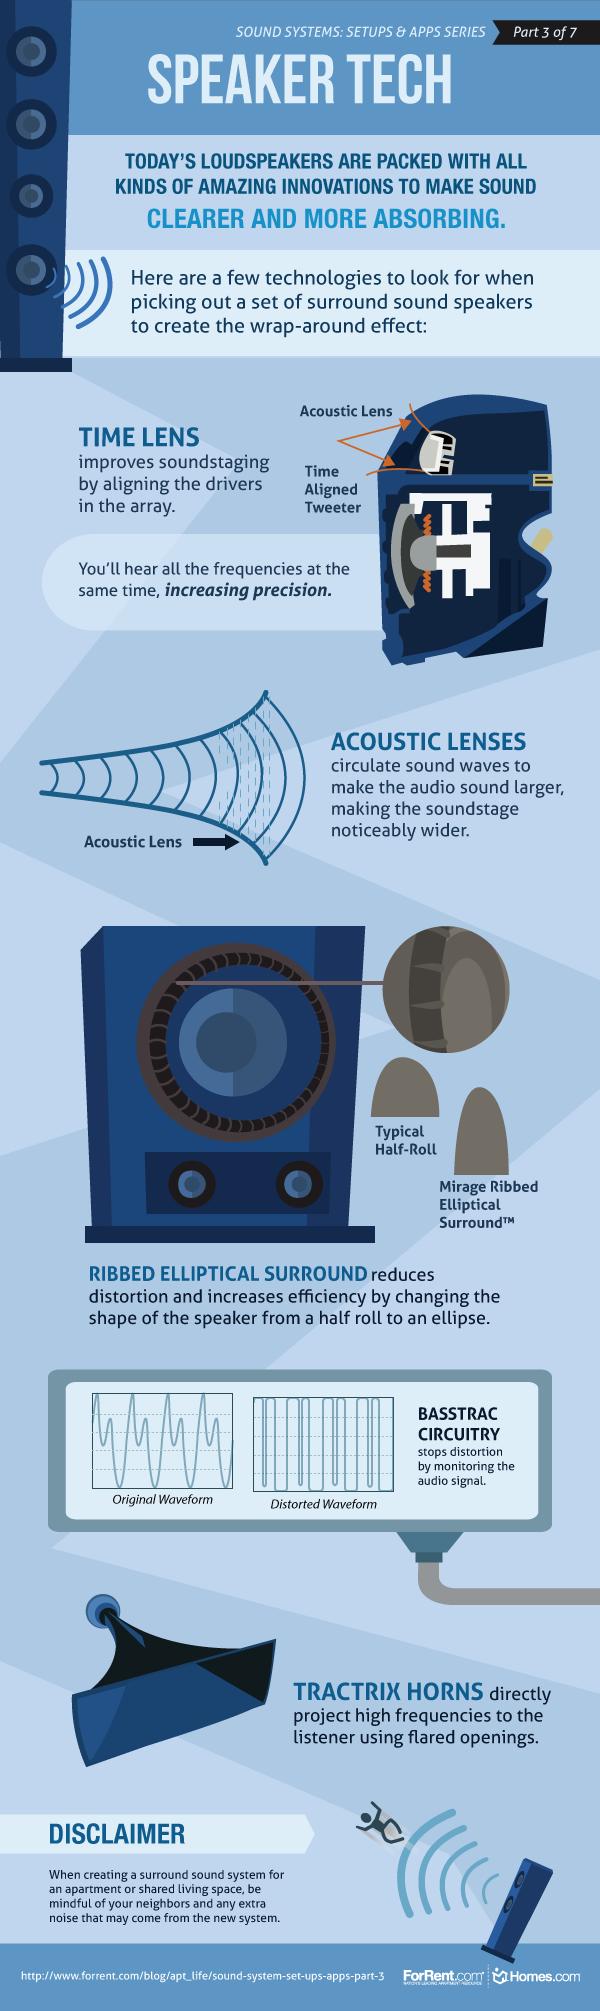 Sound System Set Ups & Apps - Part 3 | Surround sound systems ...